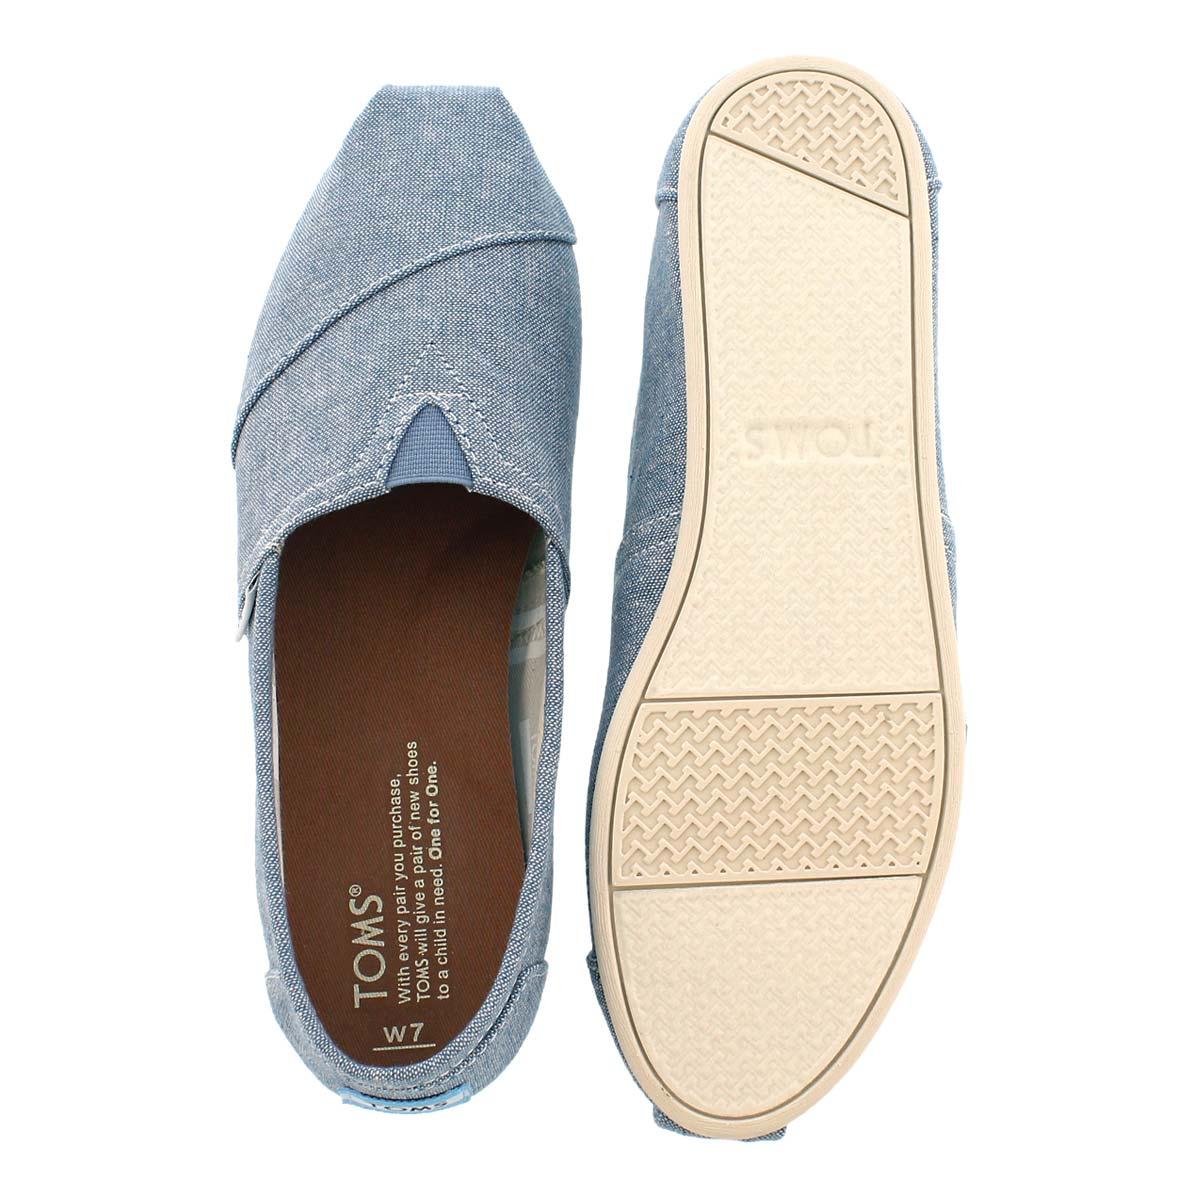 Lds Seasonal Classic blue slub loafer